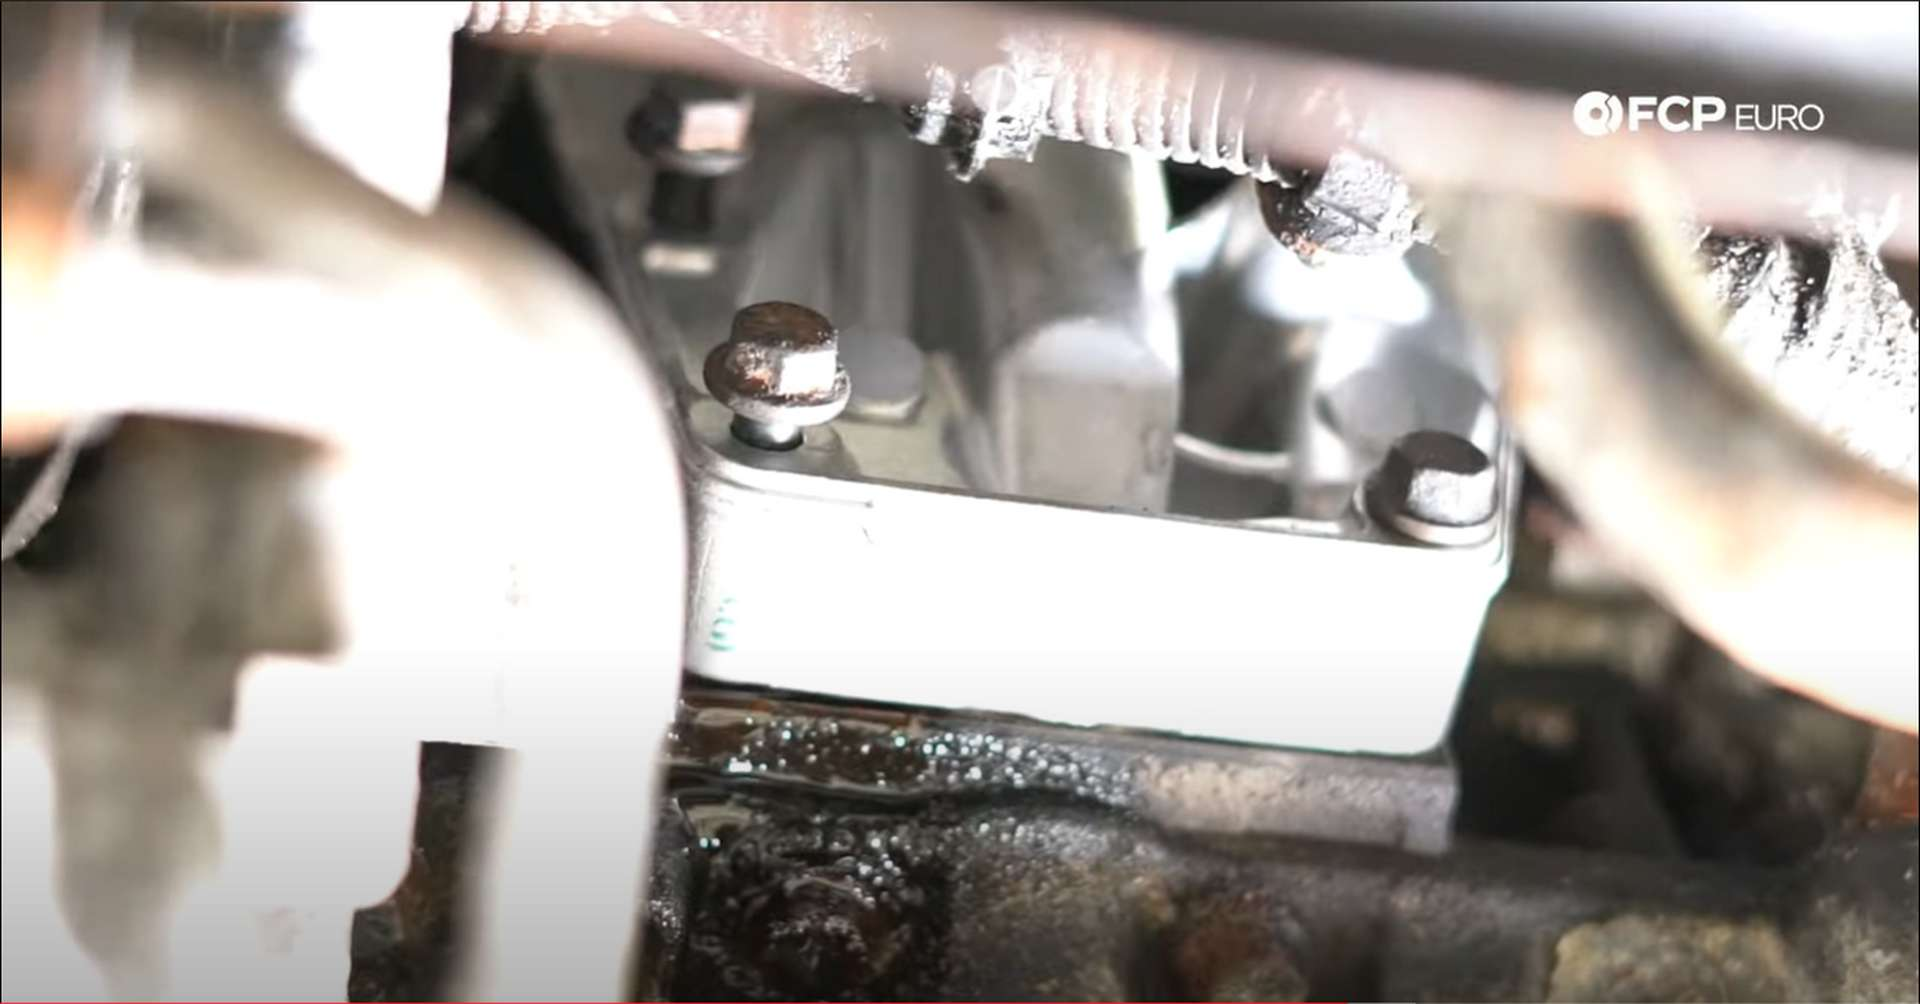 DIY Volvo PCV housing mounting bolt locations